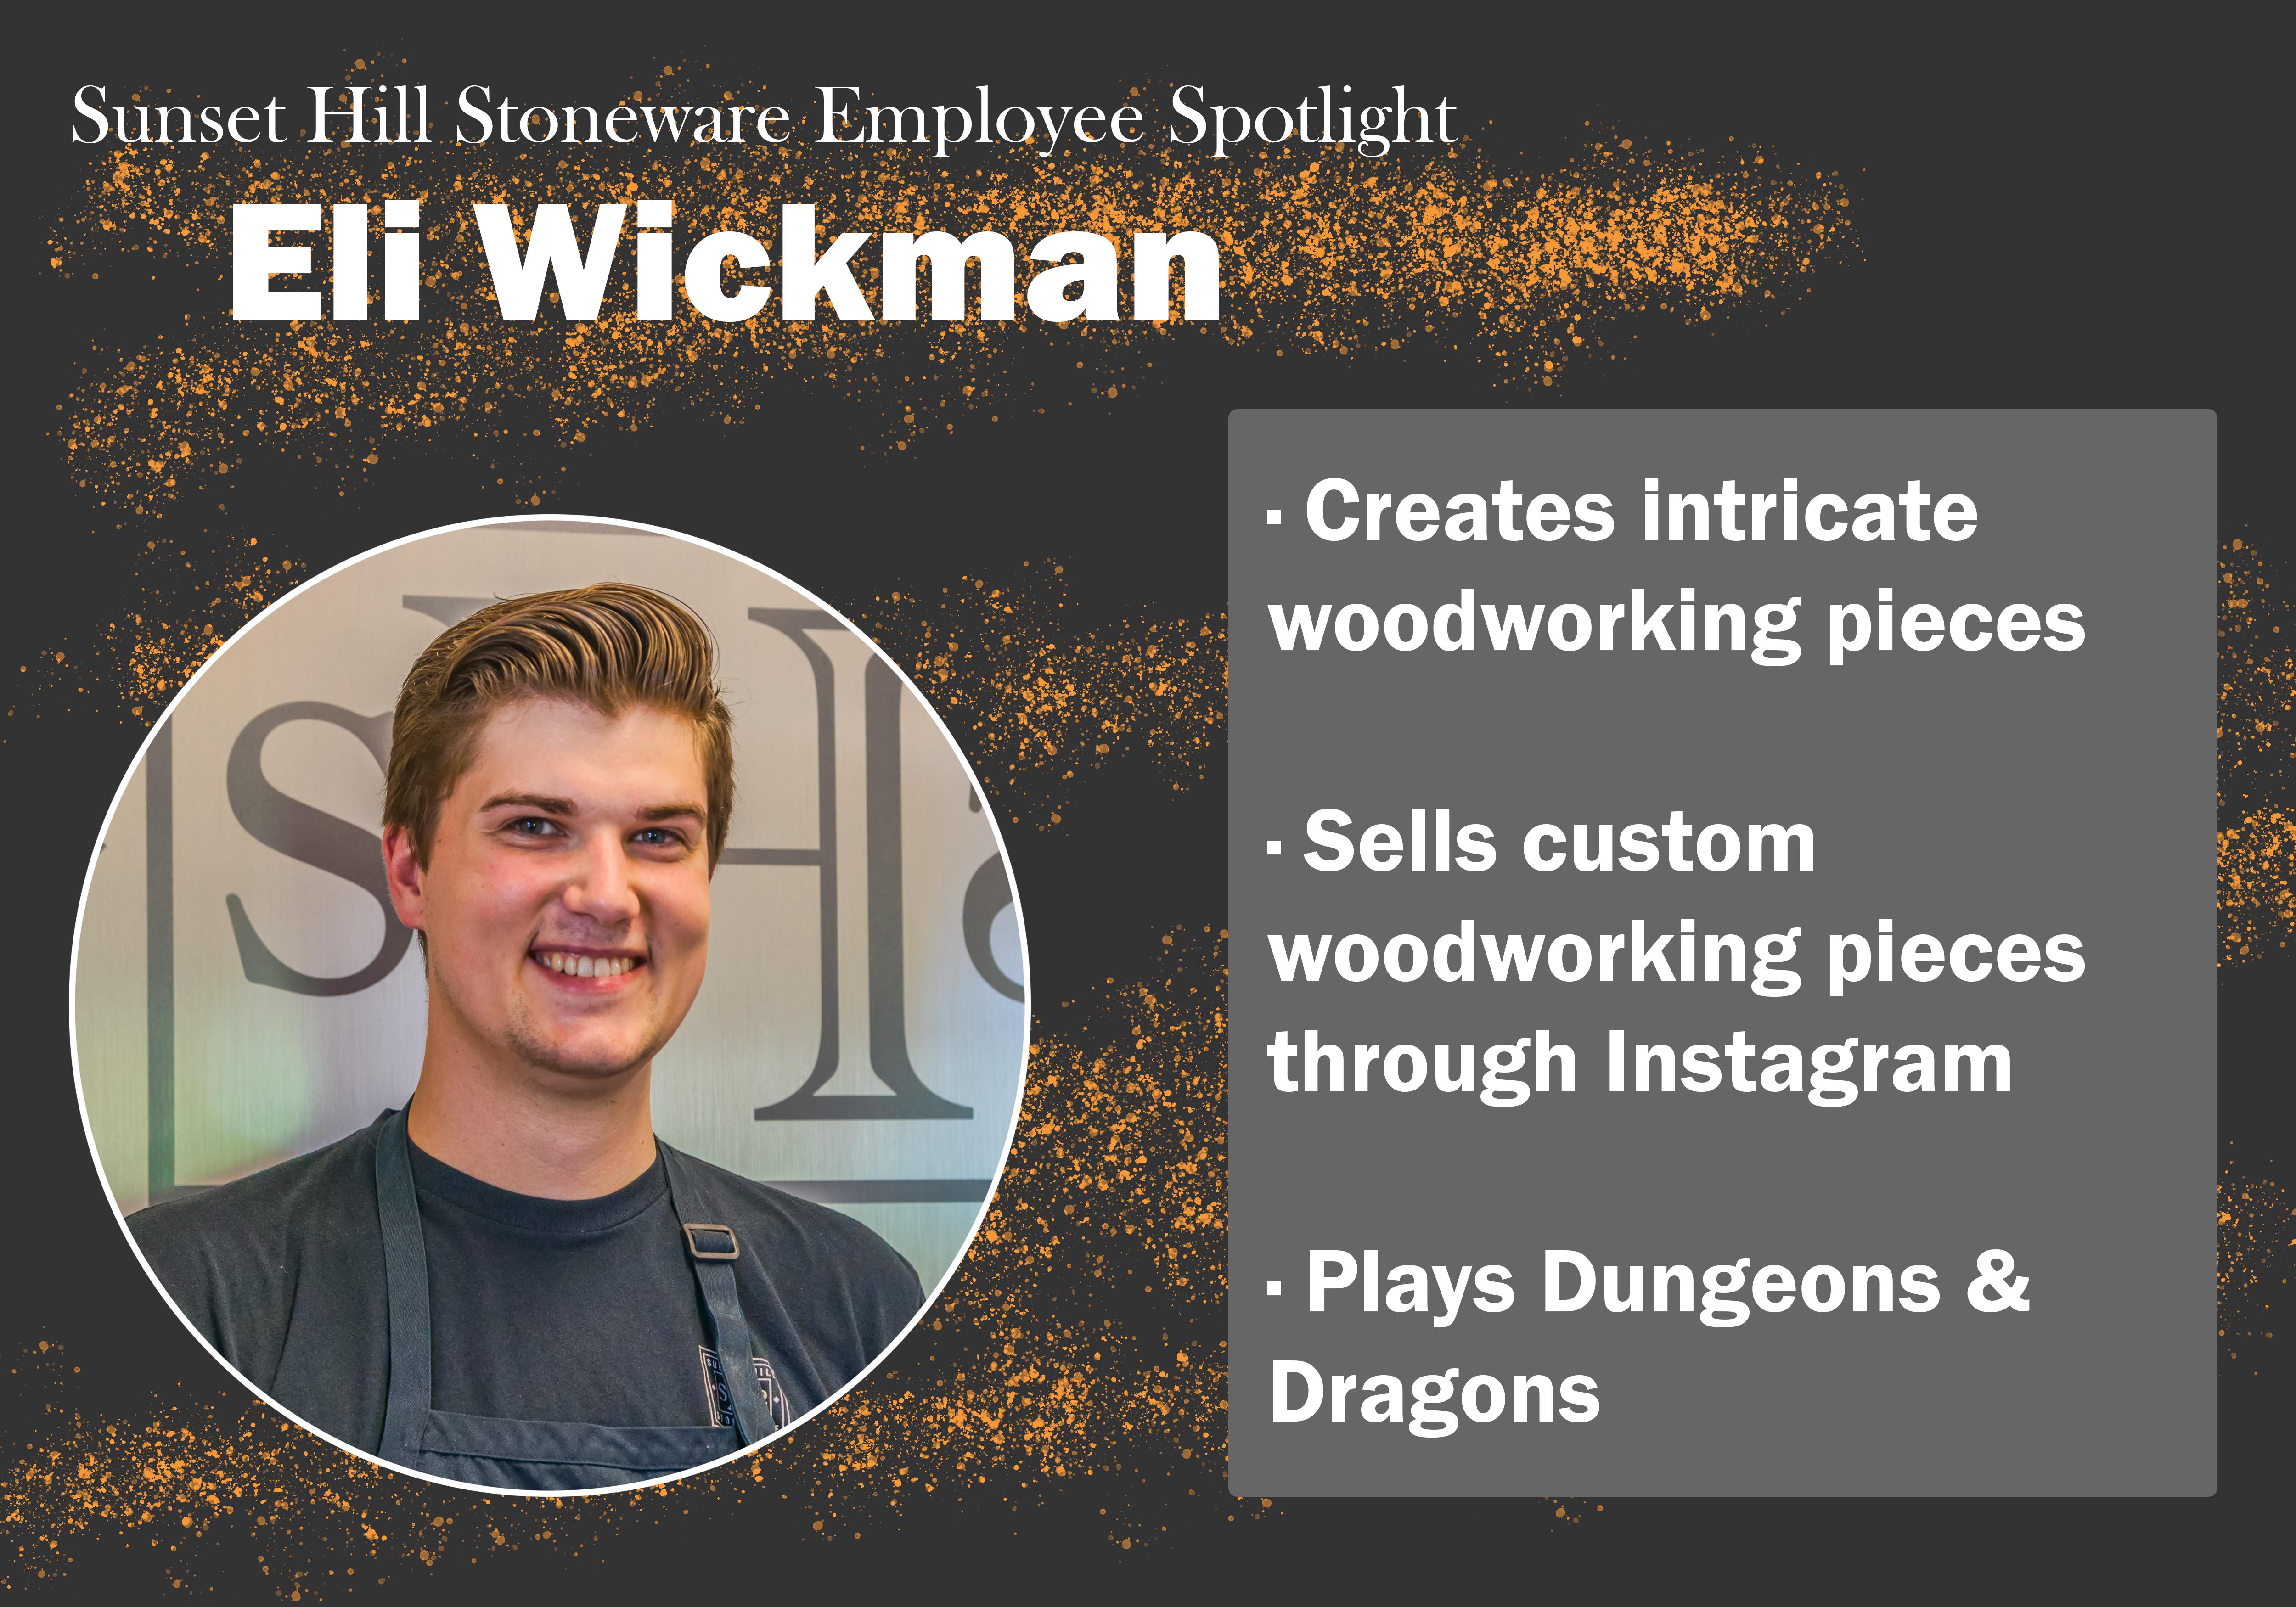 Sunset Hill Stoneware Employee Spotlight: Eli Wickman